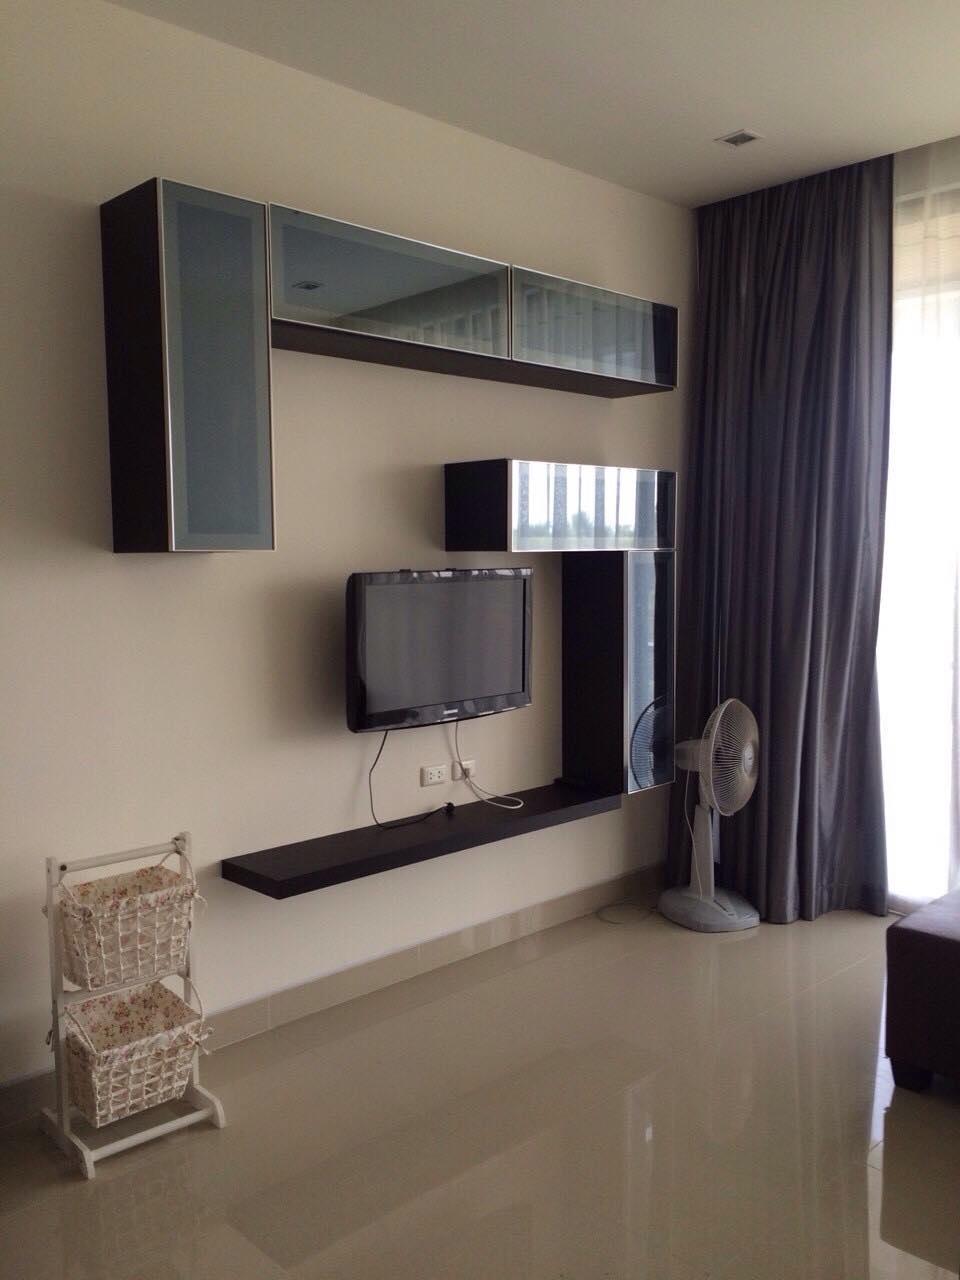 !!!Phuphatara condo near Marriott room 99/145 อพาร์ตเมนต์ 2 ห้องนอน 2 ห้องน้ำส่วนตัว ขนาด 99 ตร.ม. – แกลง